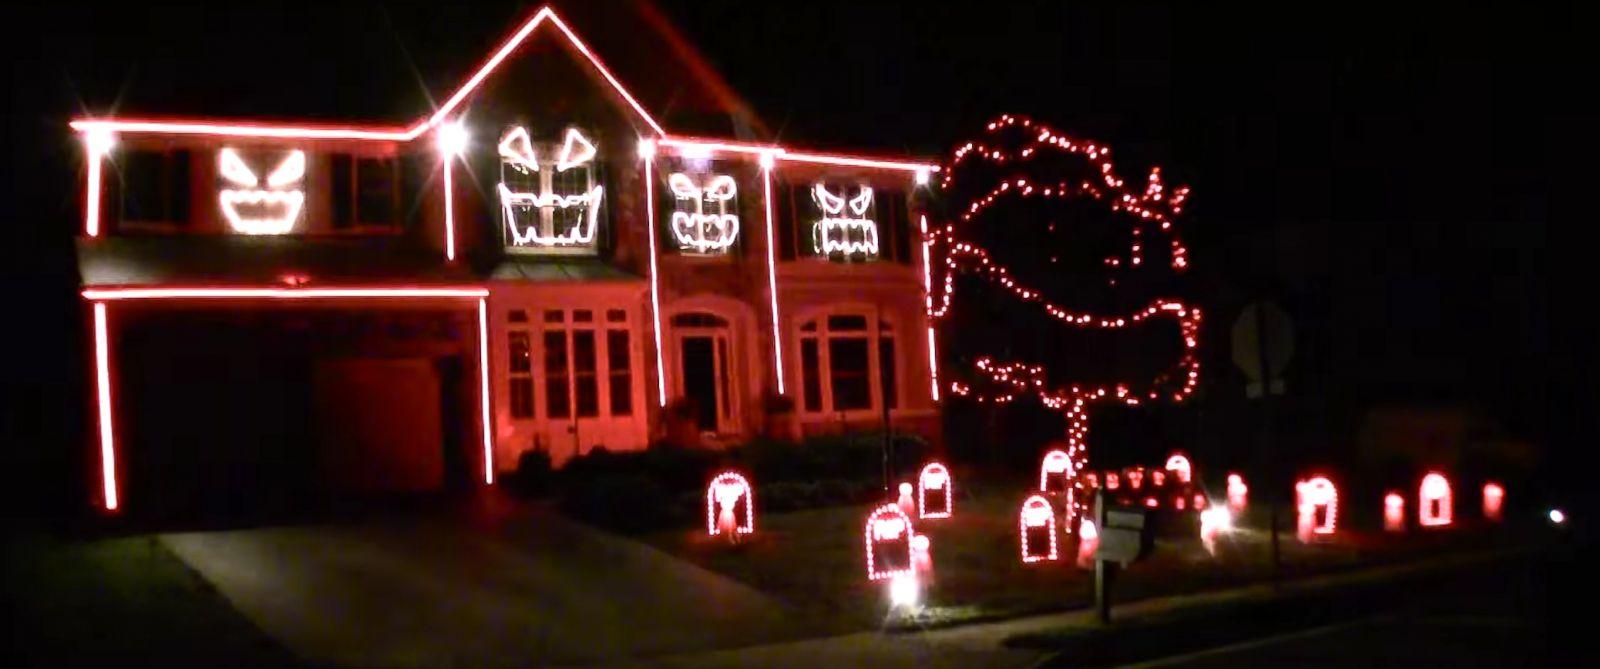 Macklemore Themed Light Show A Halloween Hit ABC News